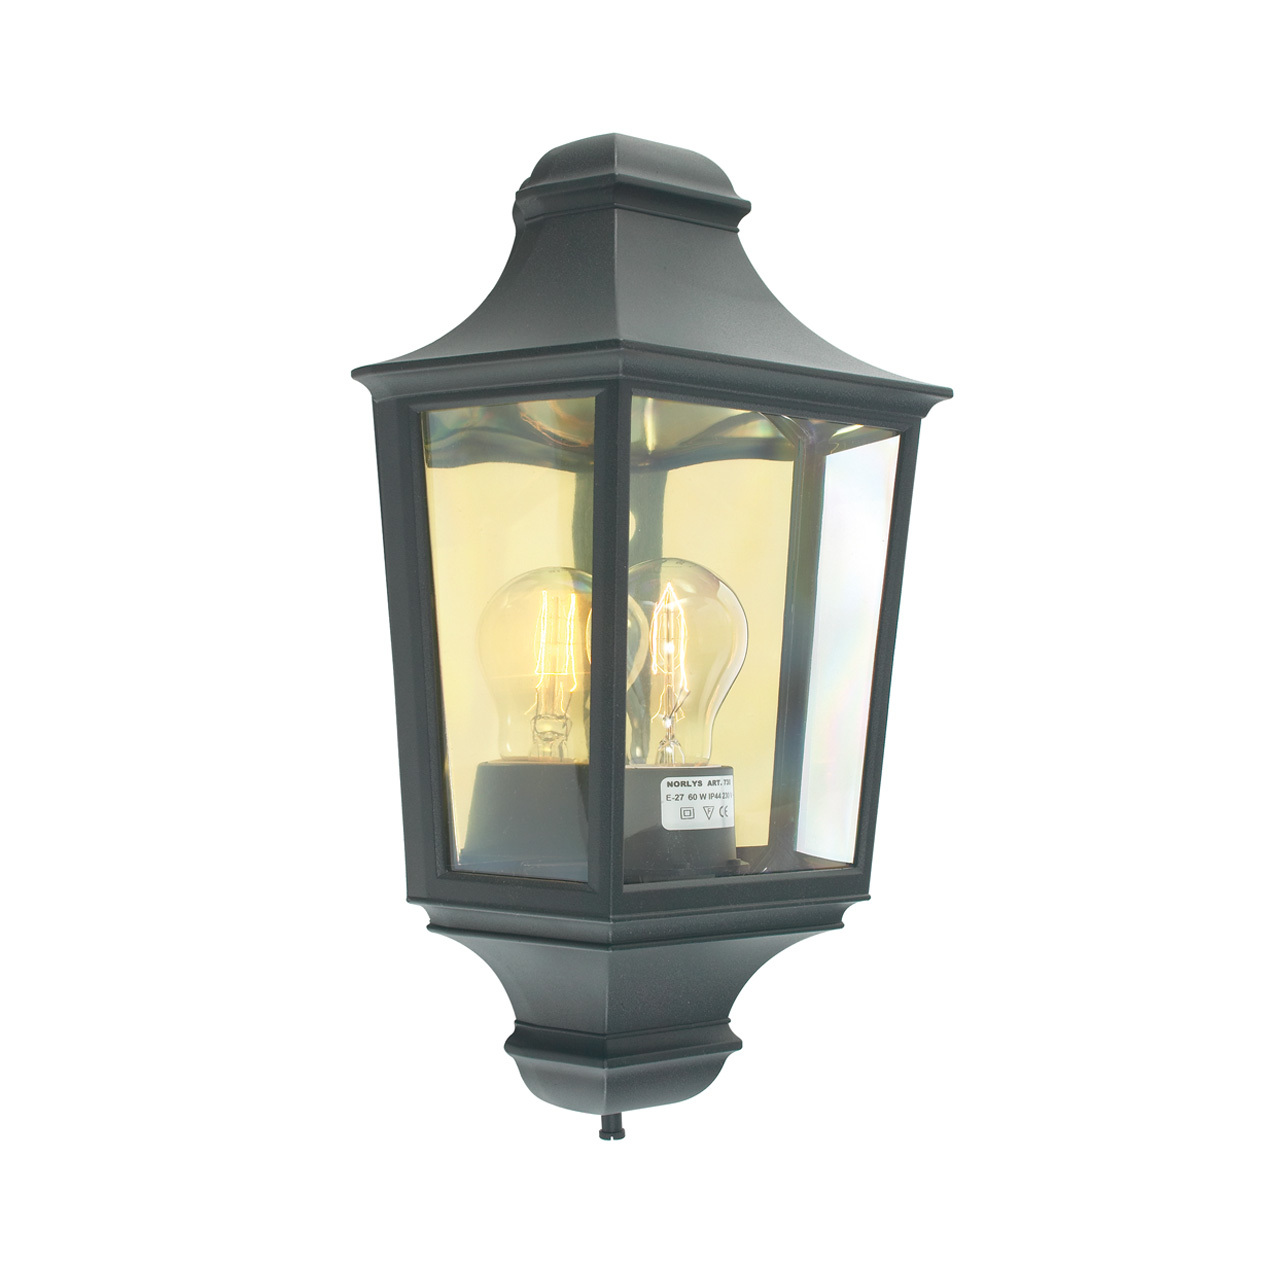 Lampa ścienna GLASGOW 730B -Norlys